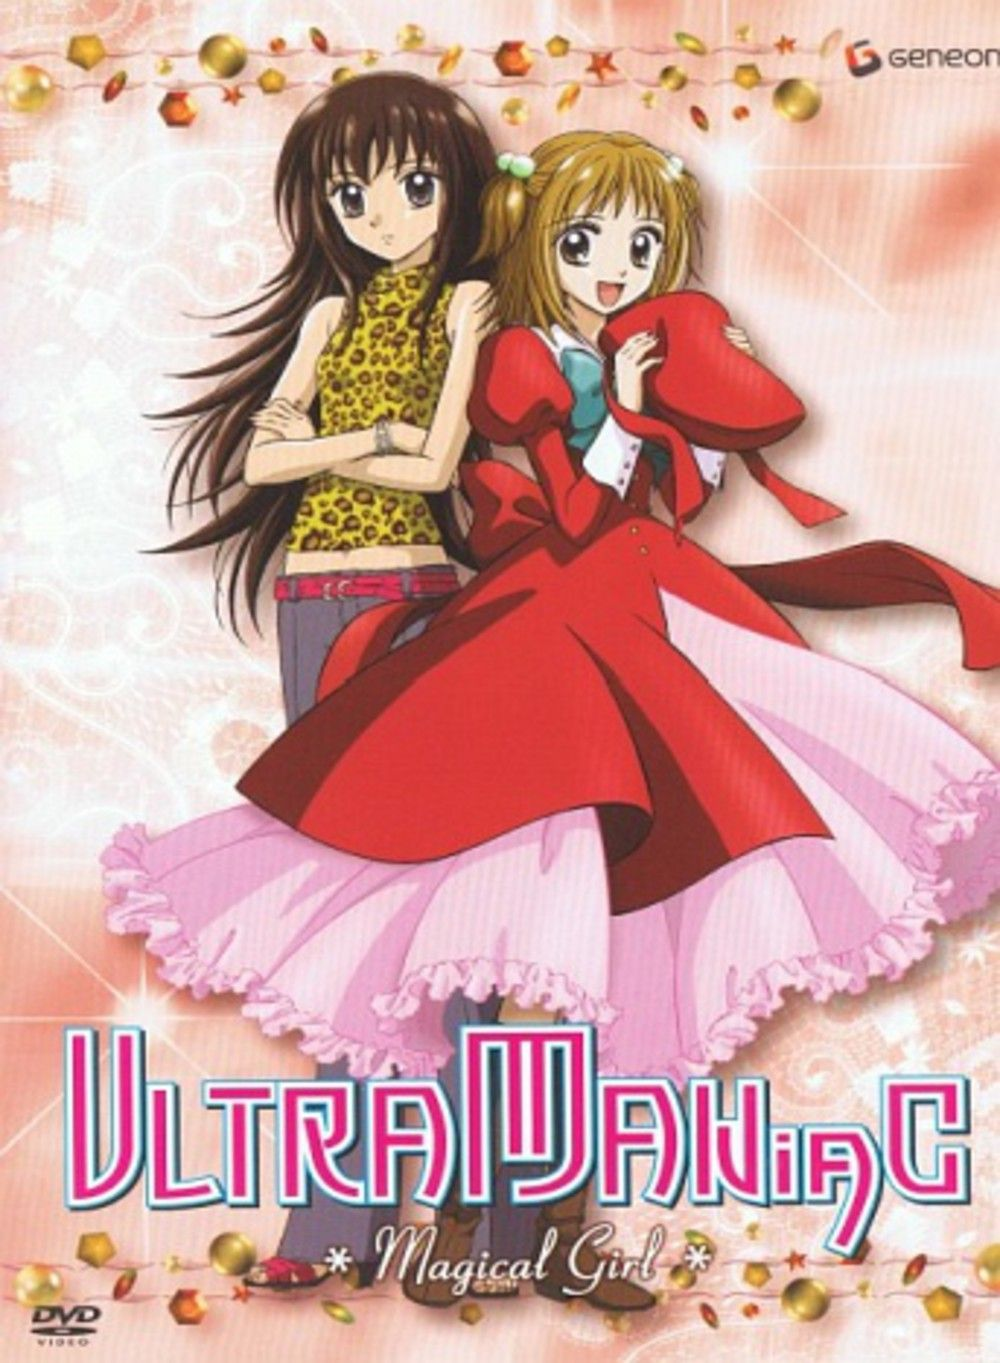 Ultra Maniac OVA (OVA) /// Genres Comedy, Magic, Romance